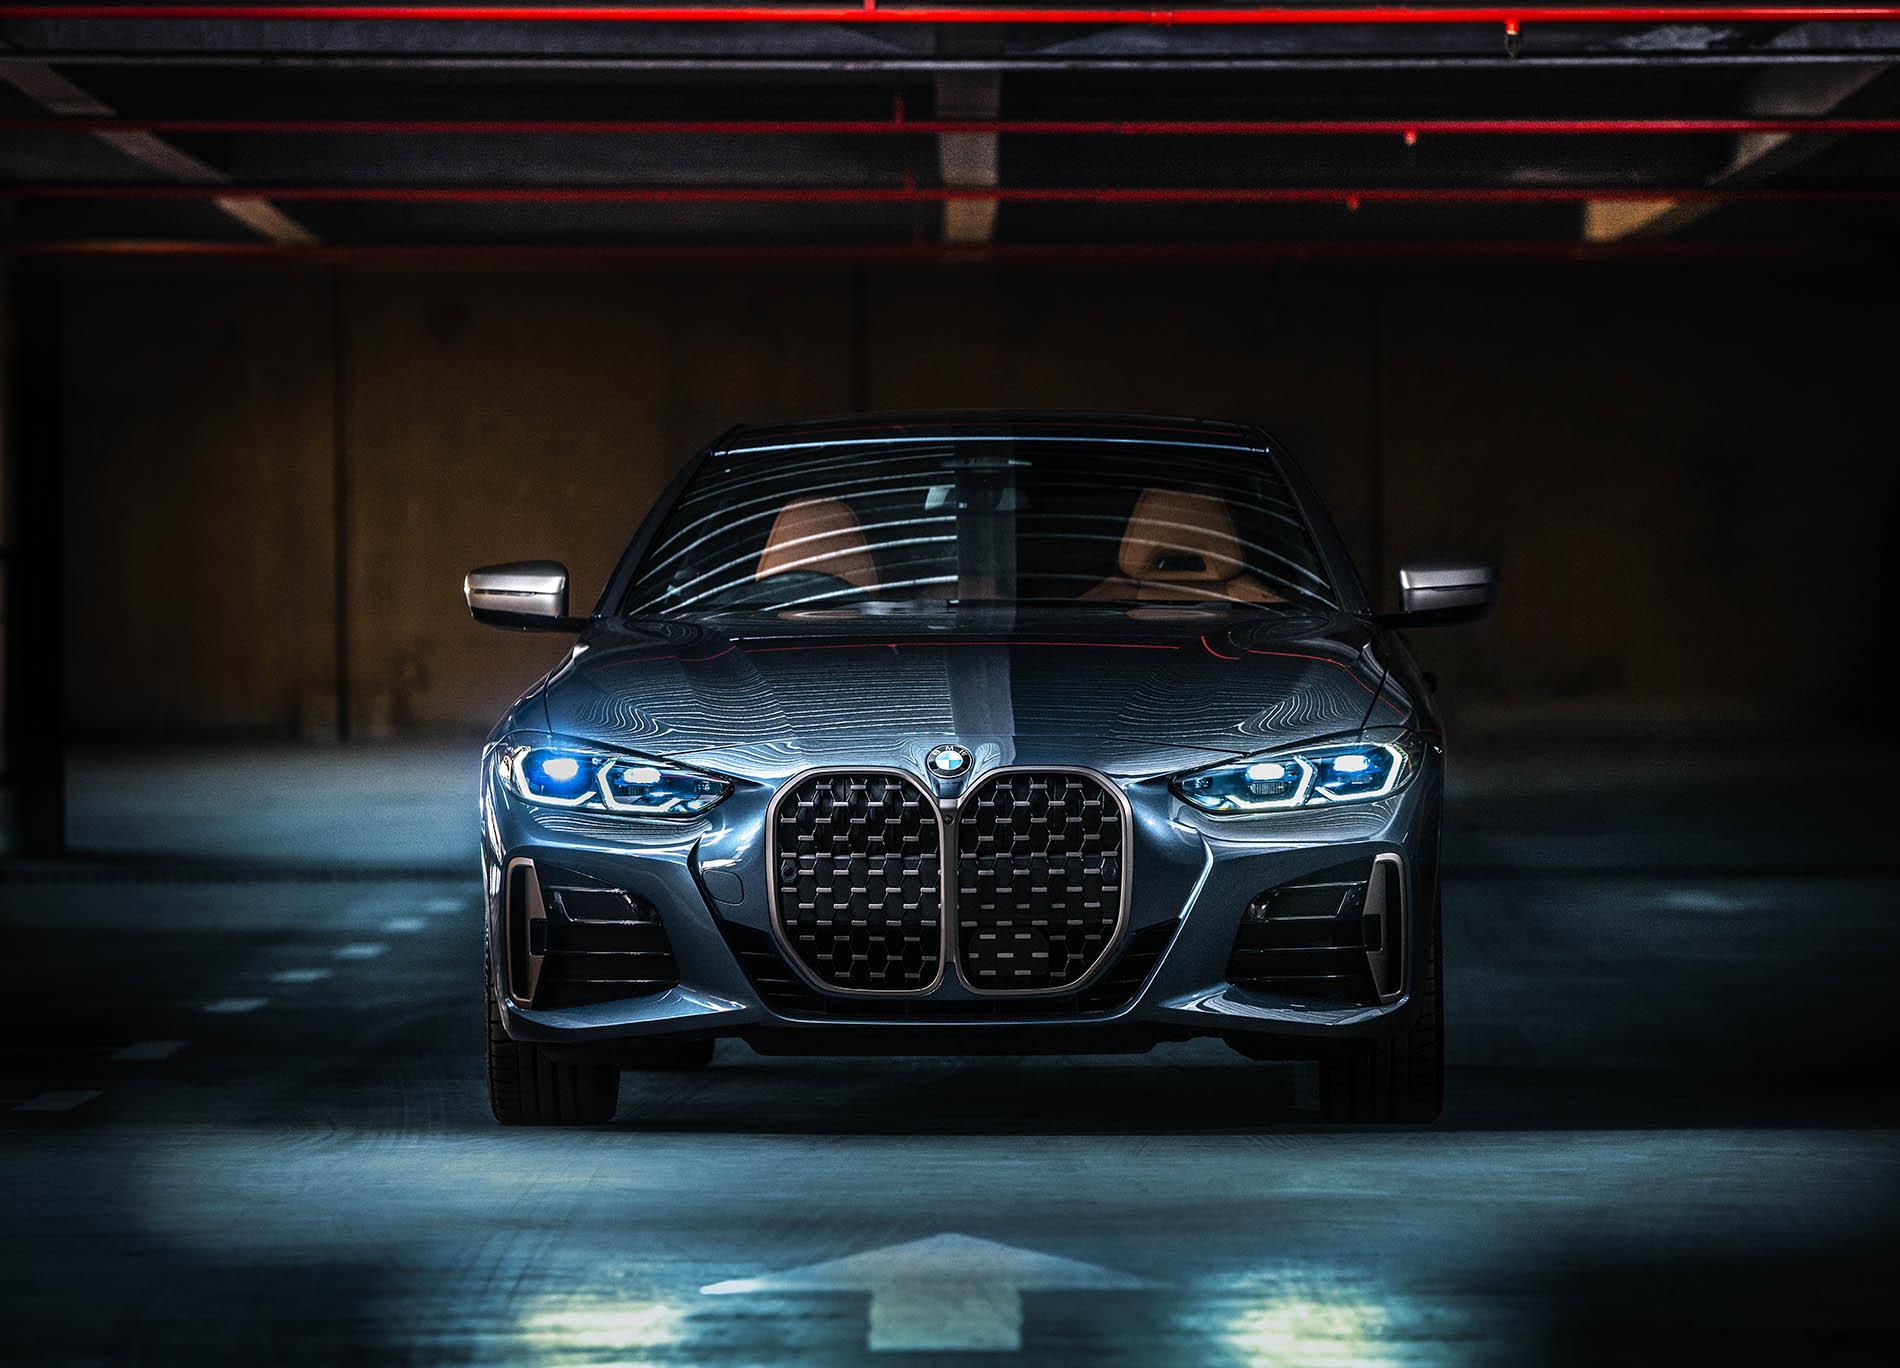 BMW car photo retouch